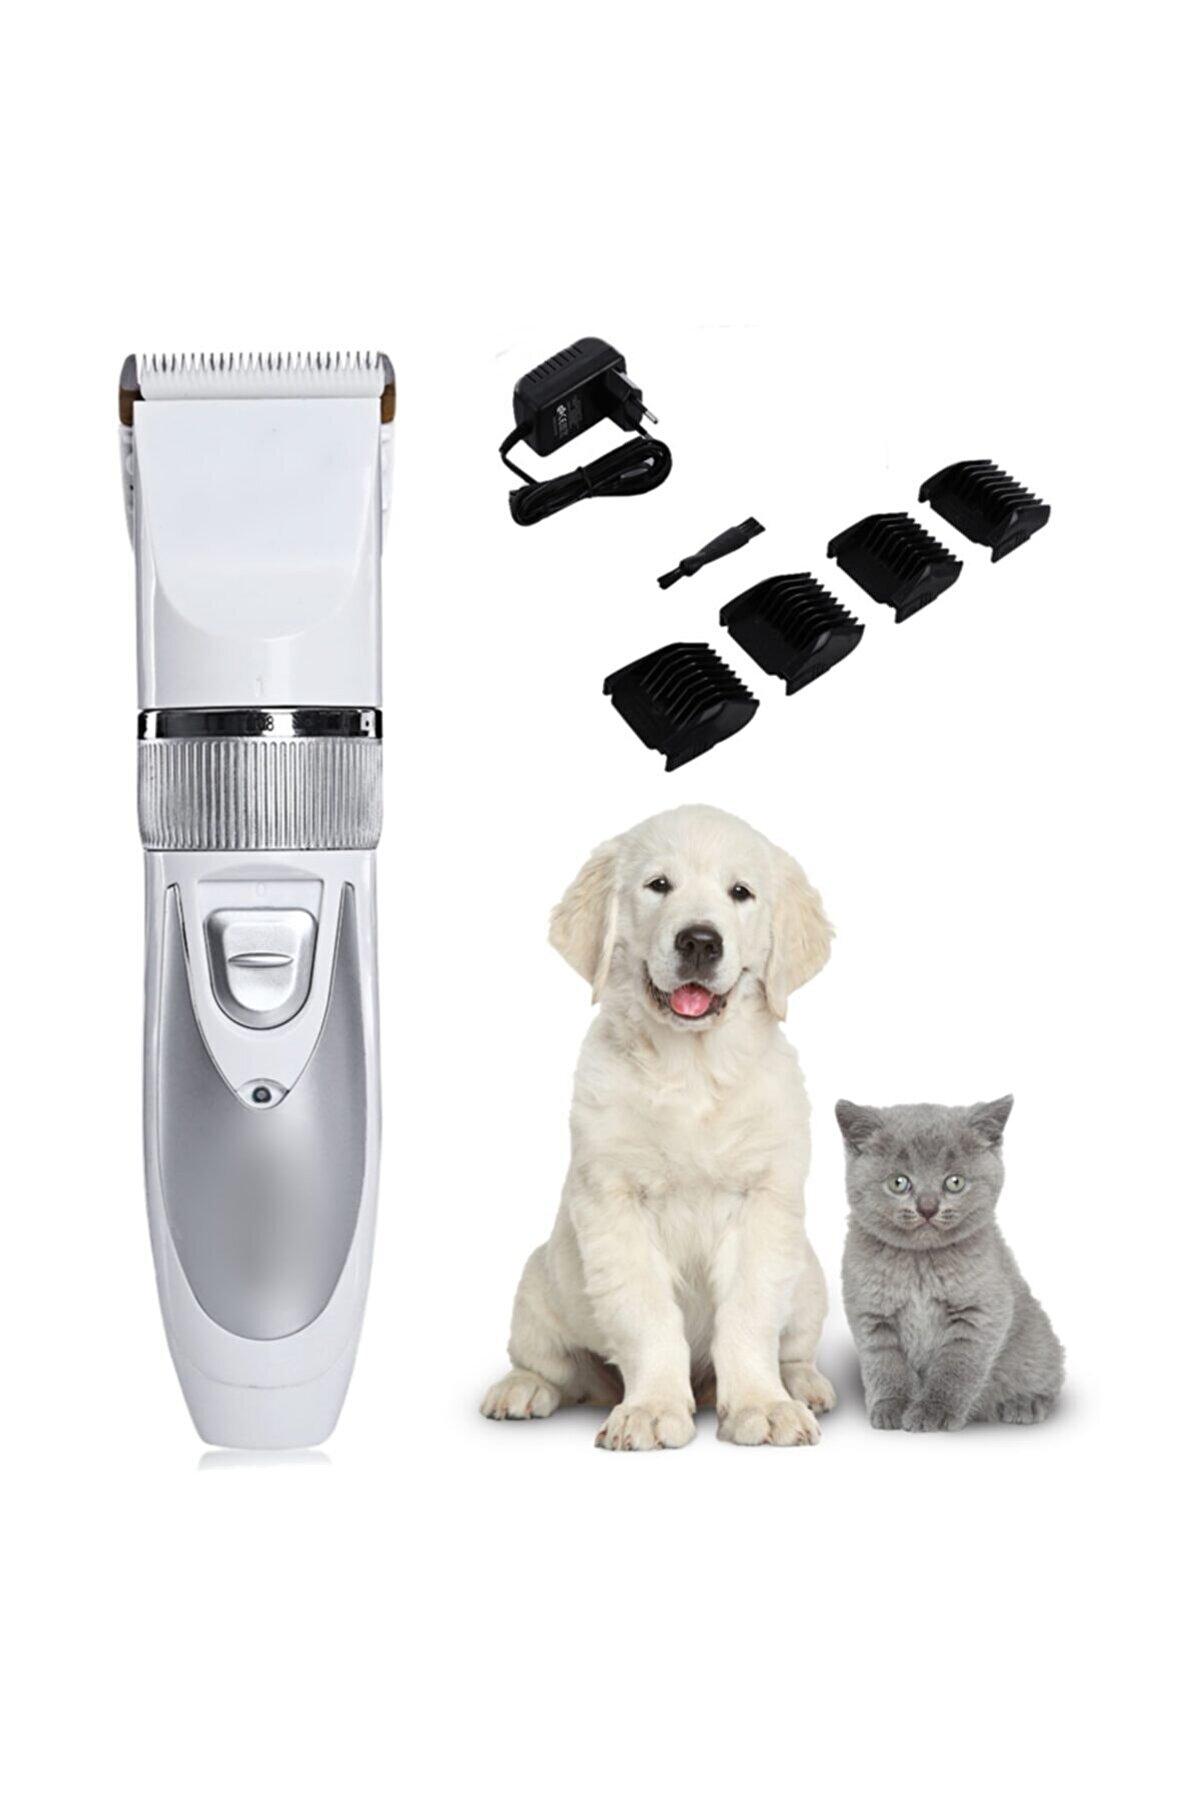 yopigo Çift Bataryalı Evcil Hayvan Tüy Kesme Kedi Köpek Traş Tıraş Makinesi Seti